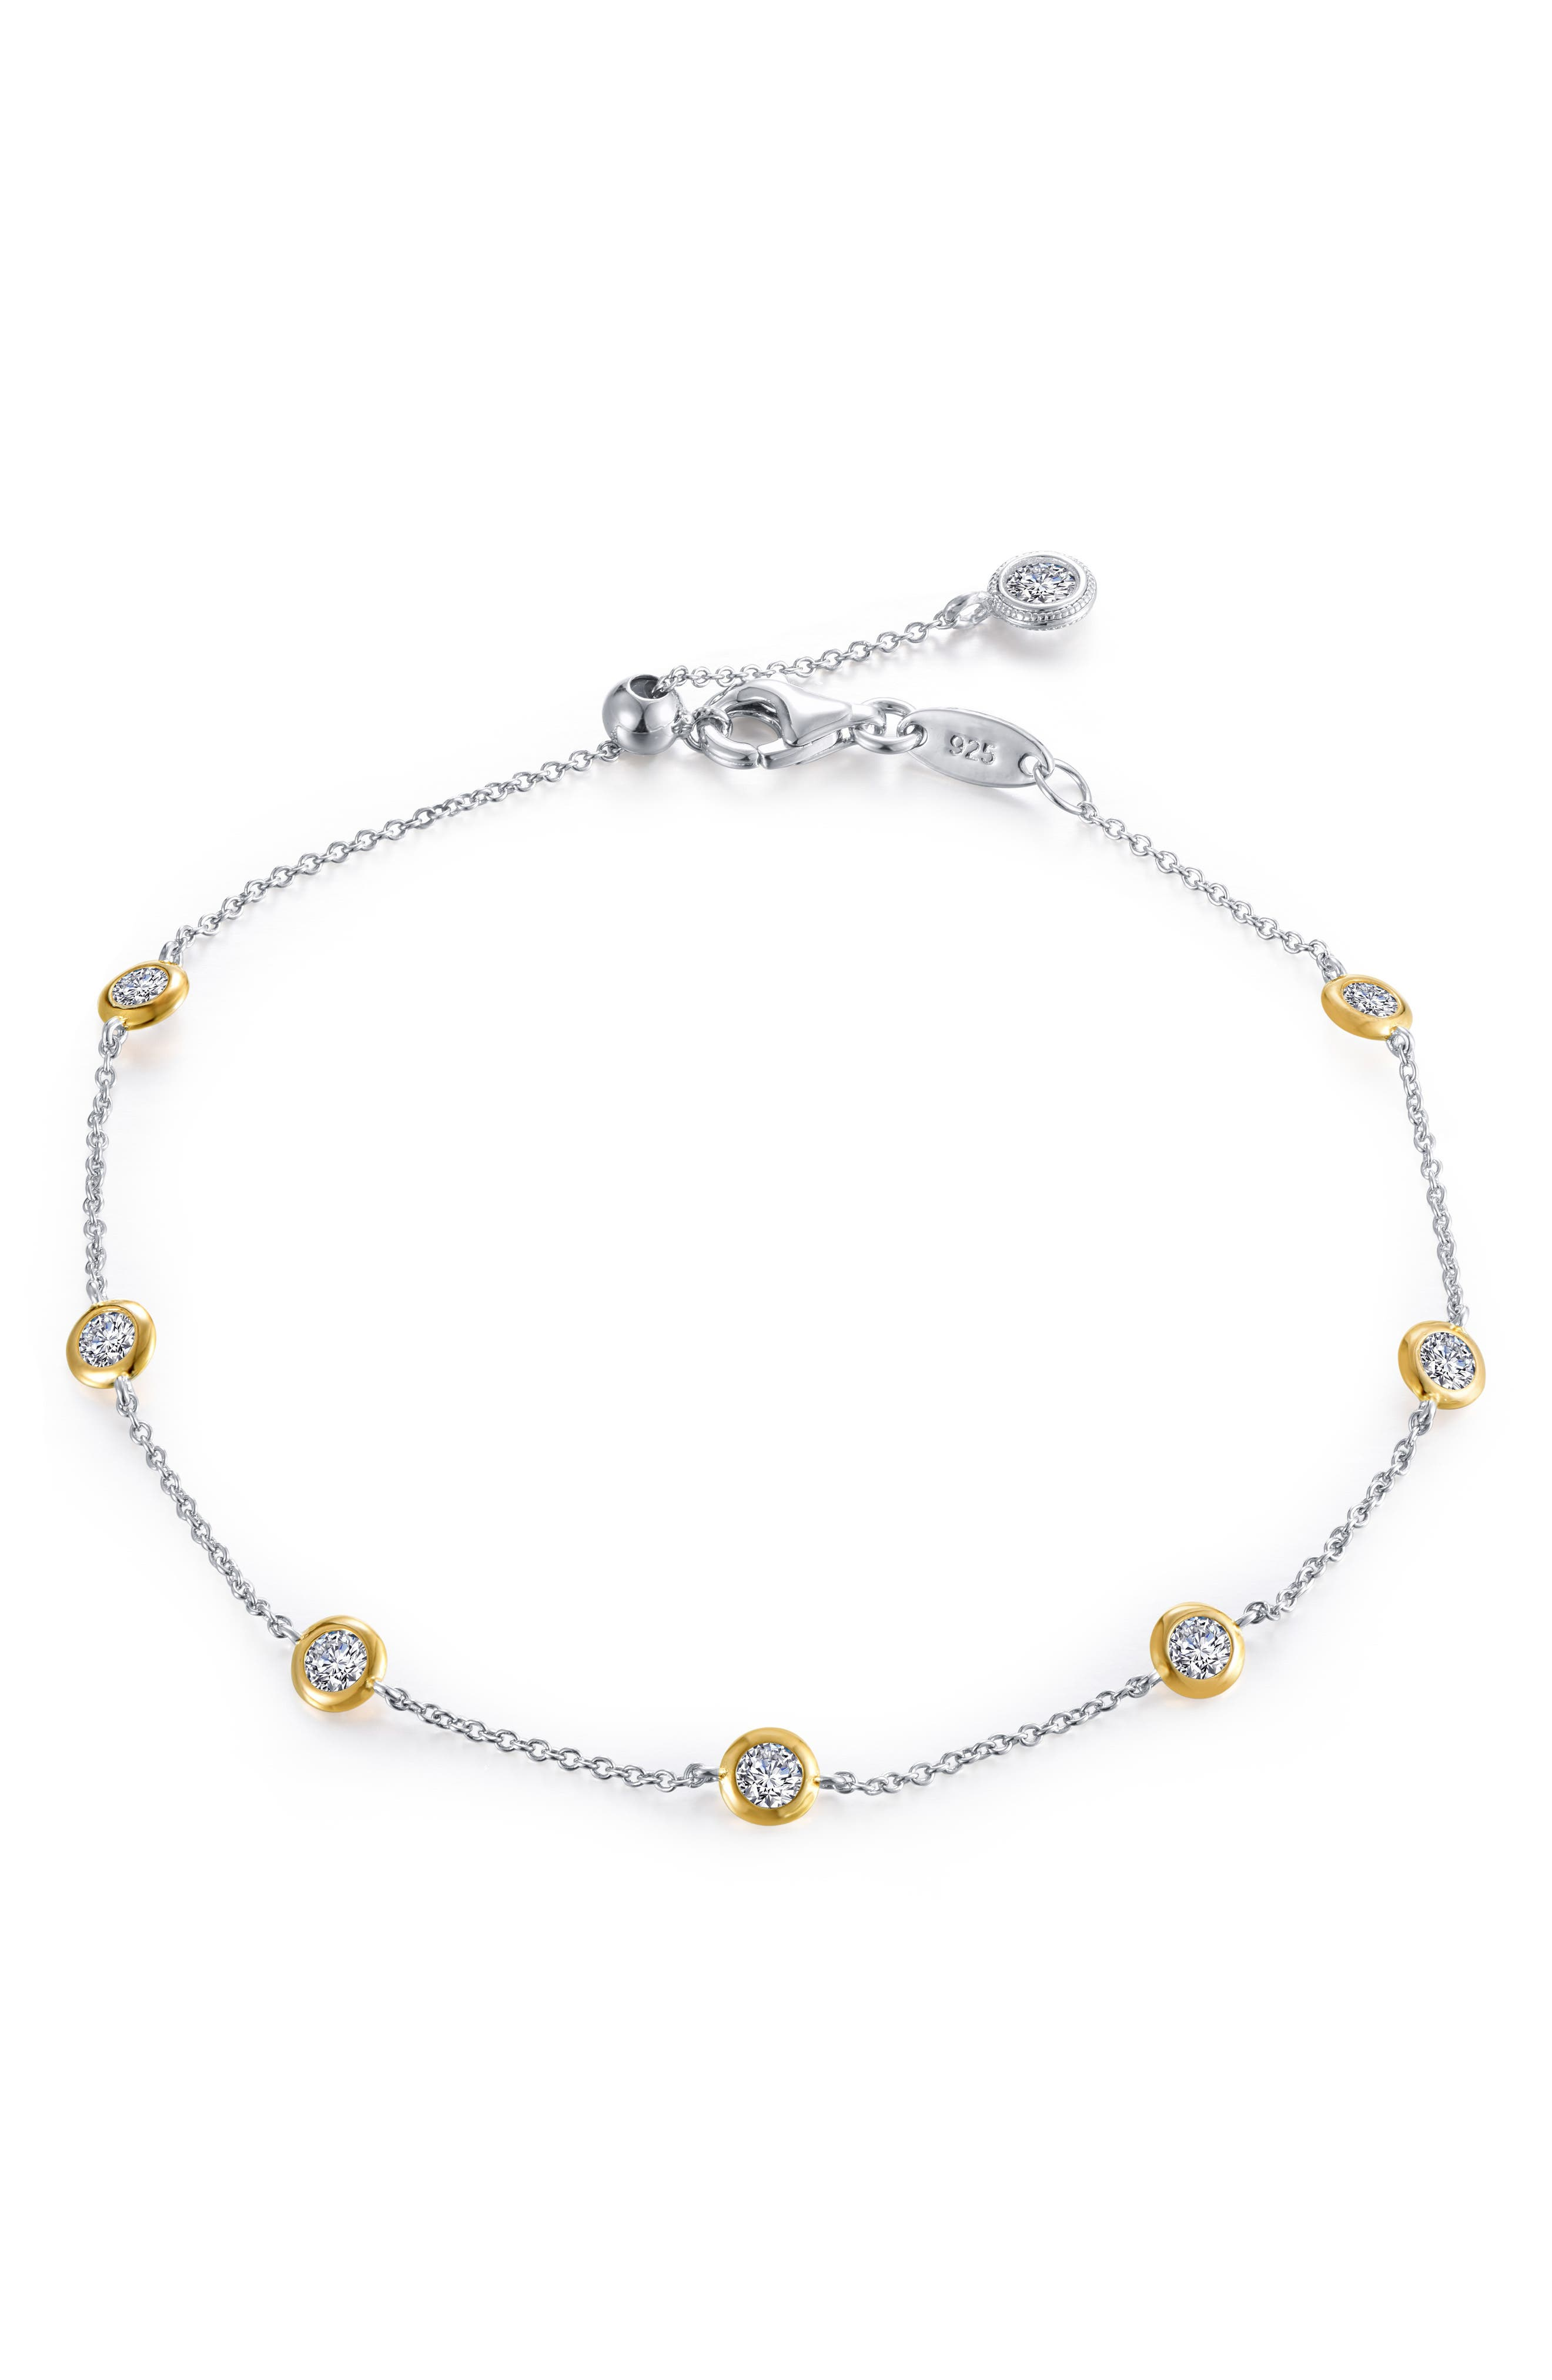 LAFONN Symbols of Joy Simulated Diamond Bracelet, Main, color, SILVER/ GOLD/ CLEAR